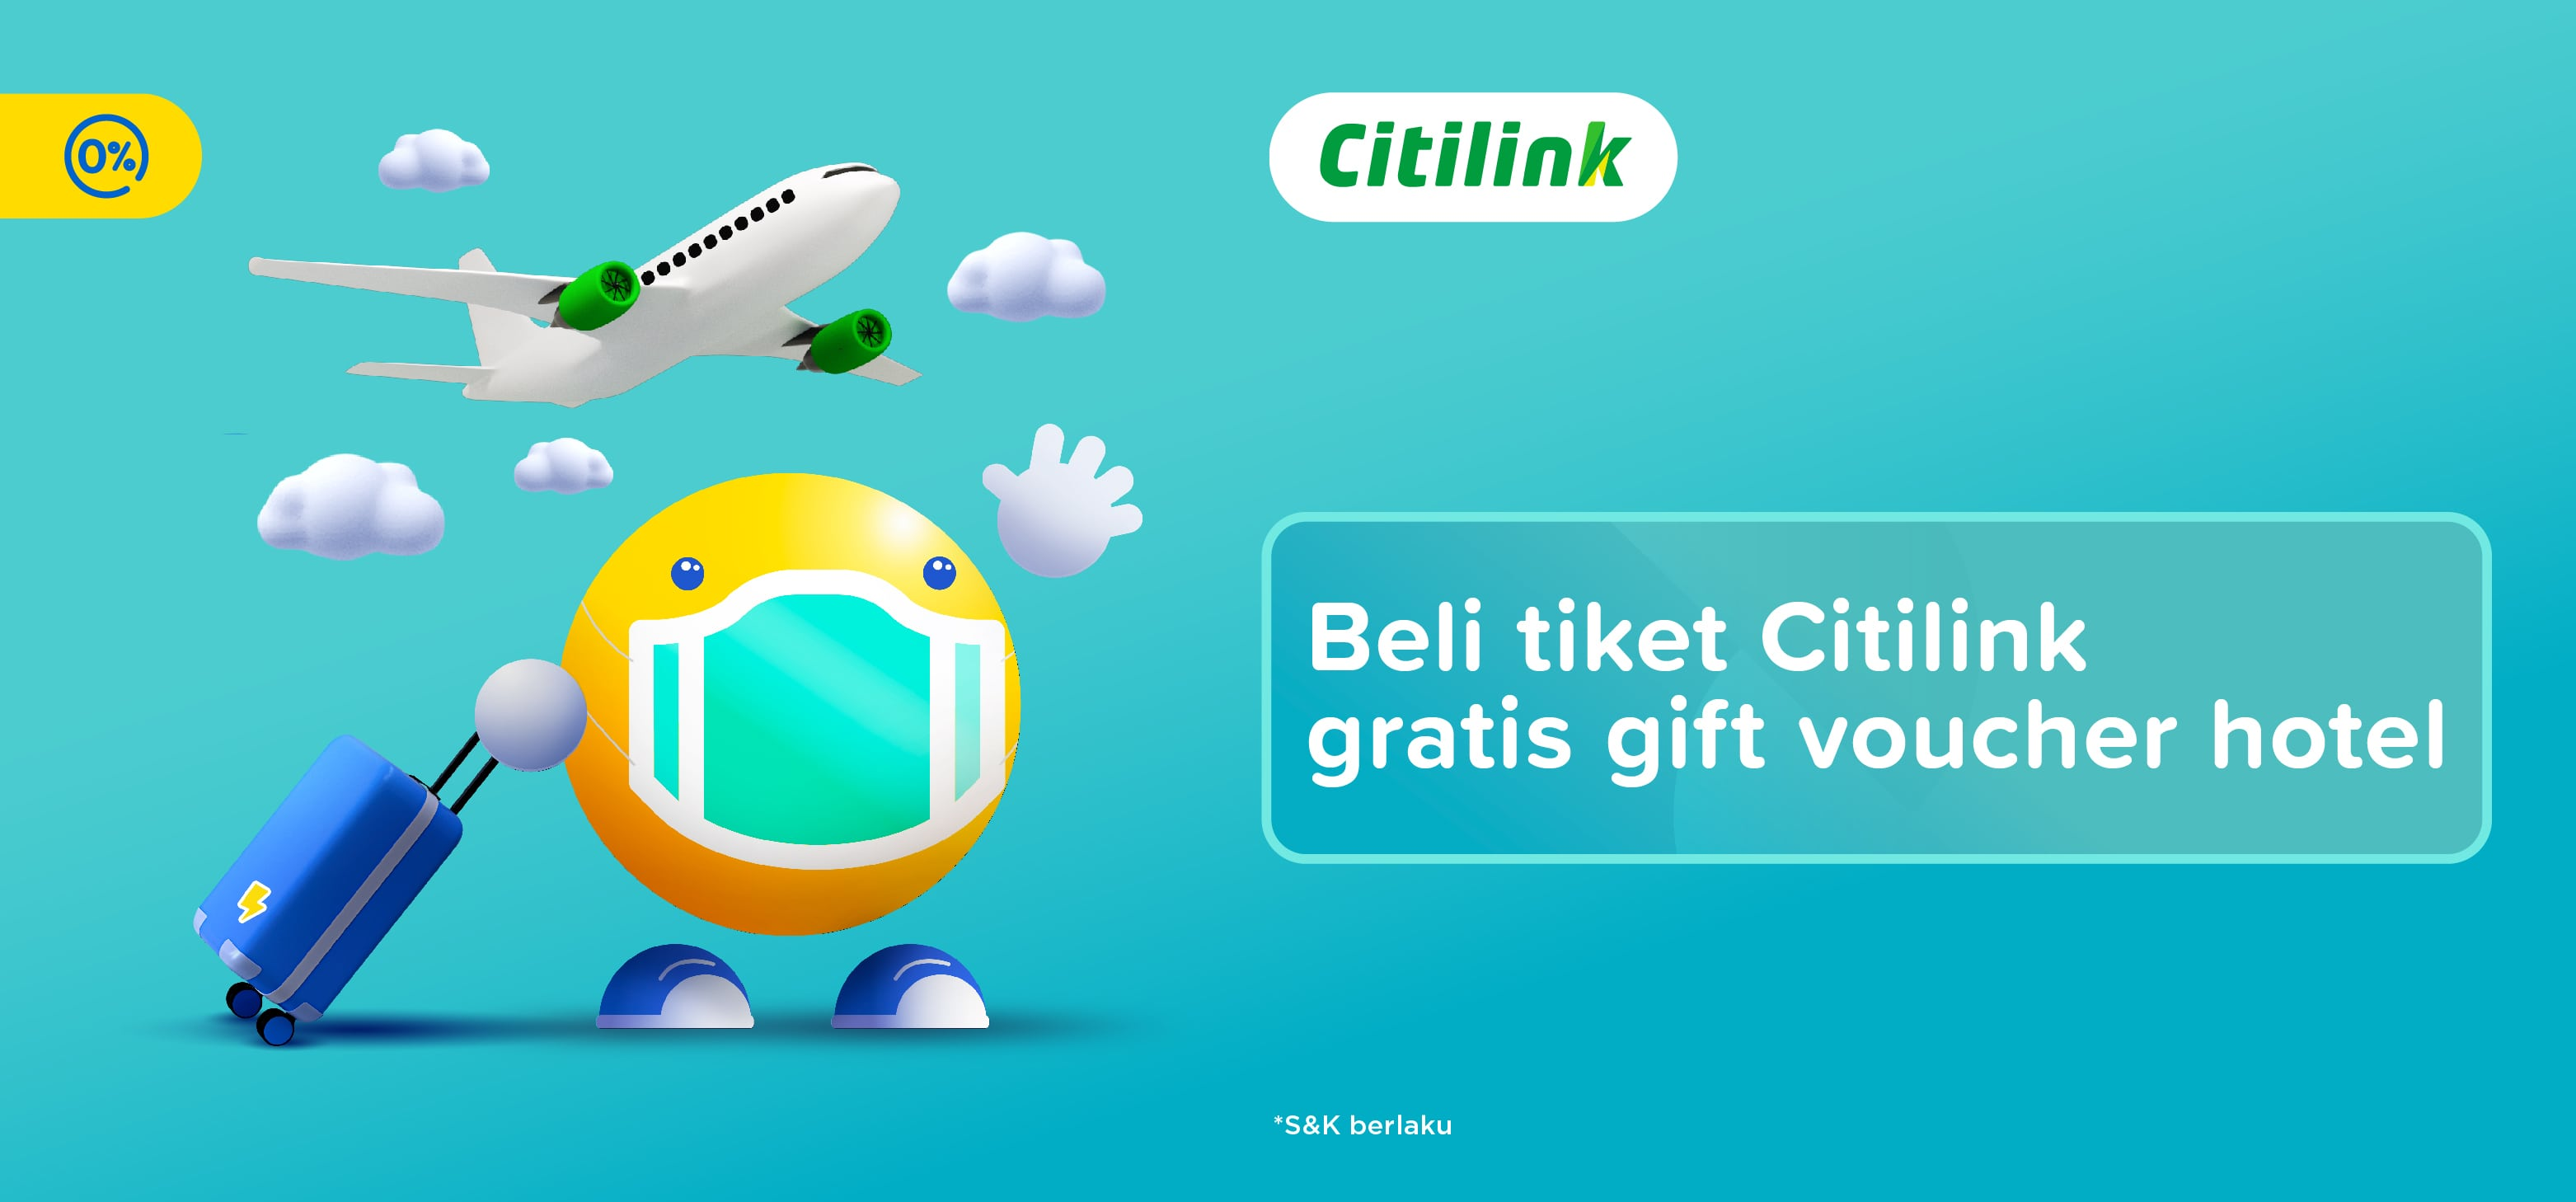 Promo Tiket Pesawat Citilink Gratis Voucher Hotel Tiket Com